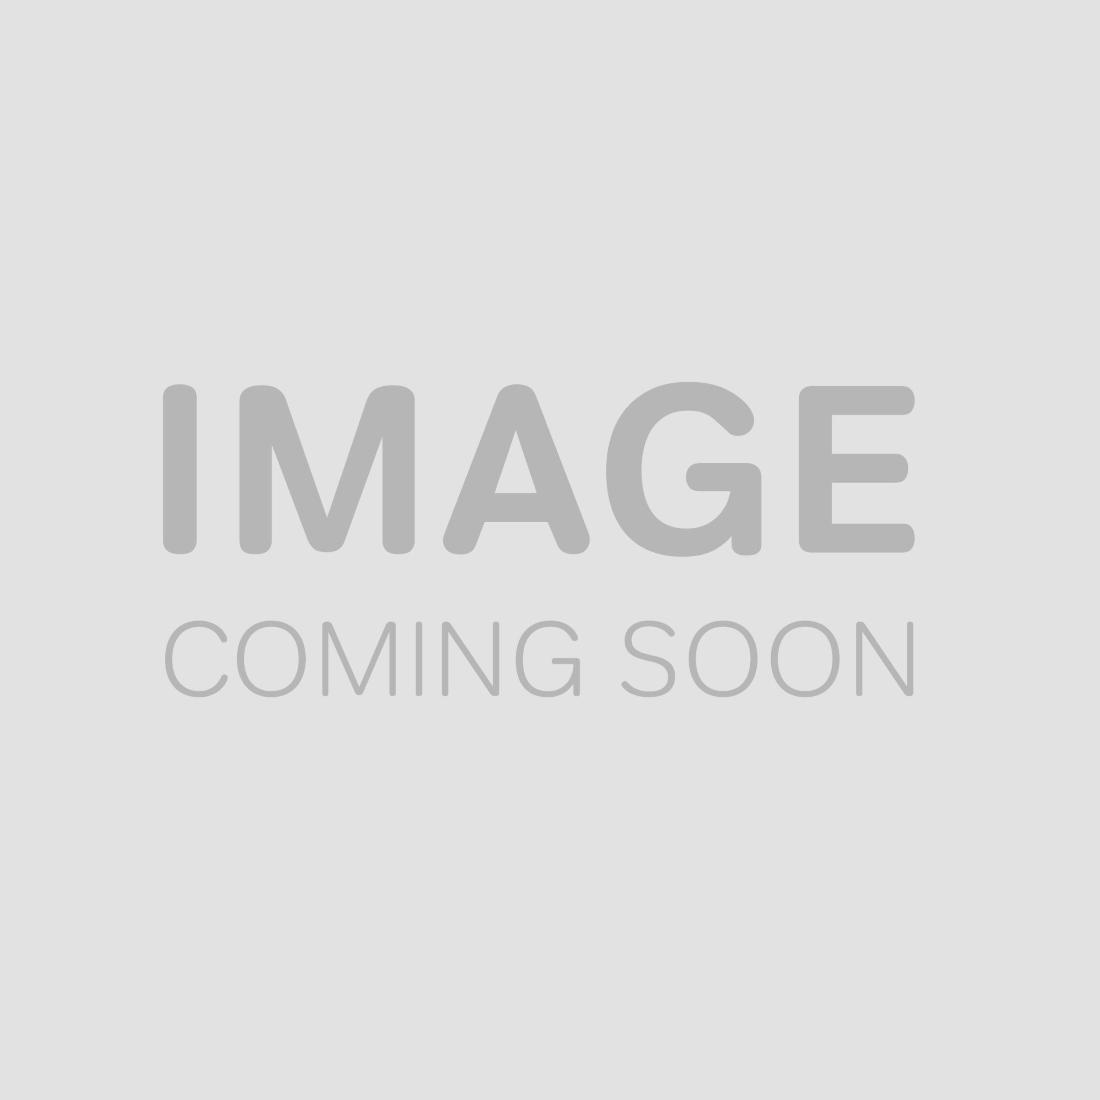 SOL - CARE Blunt Fill Needle 18gx1 1/2